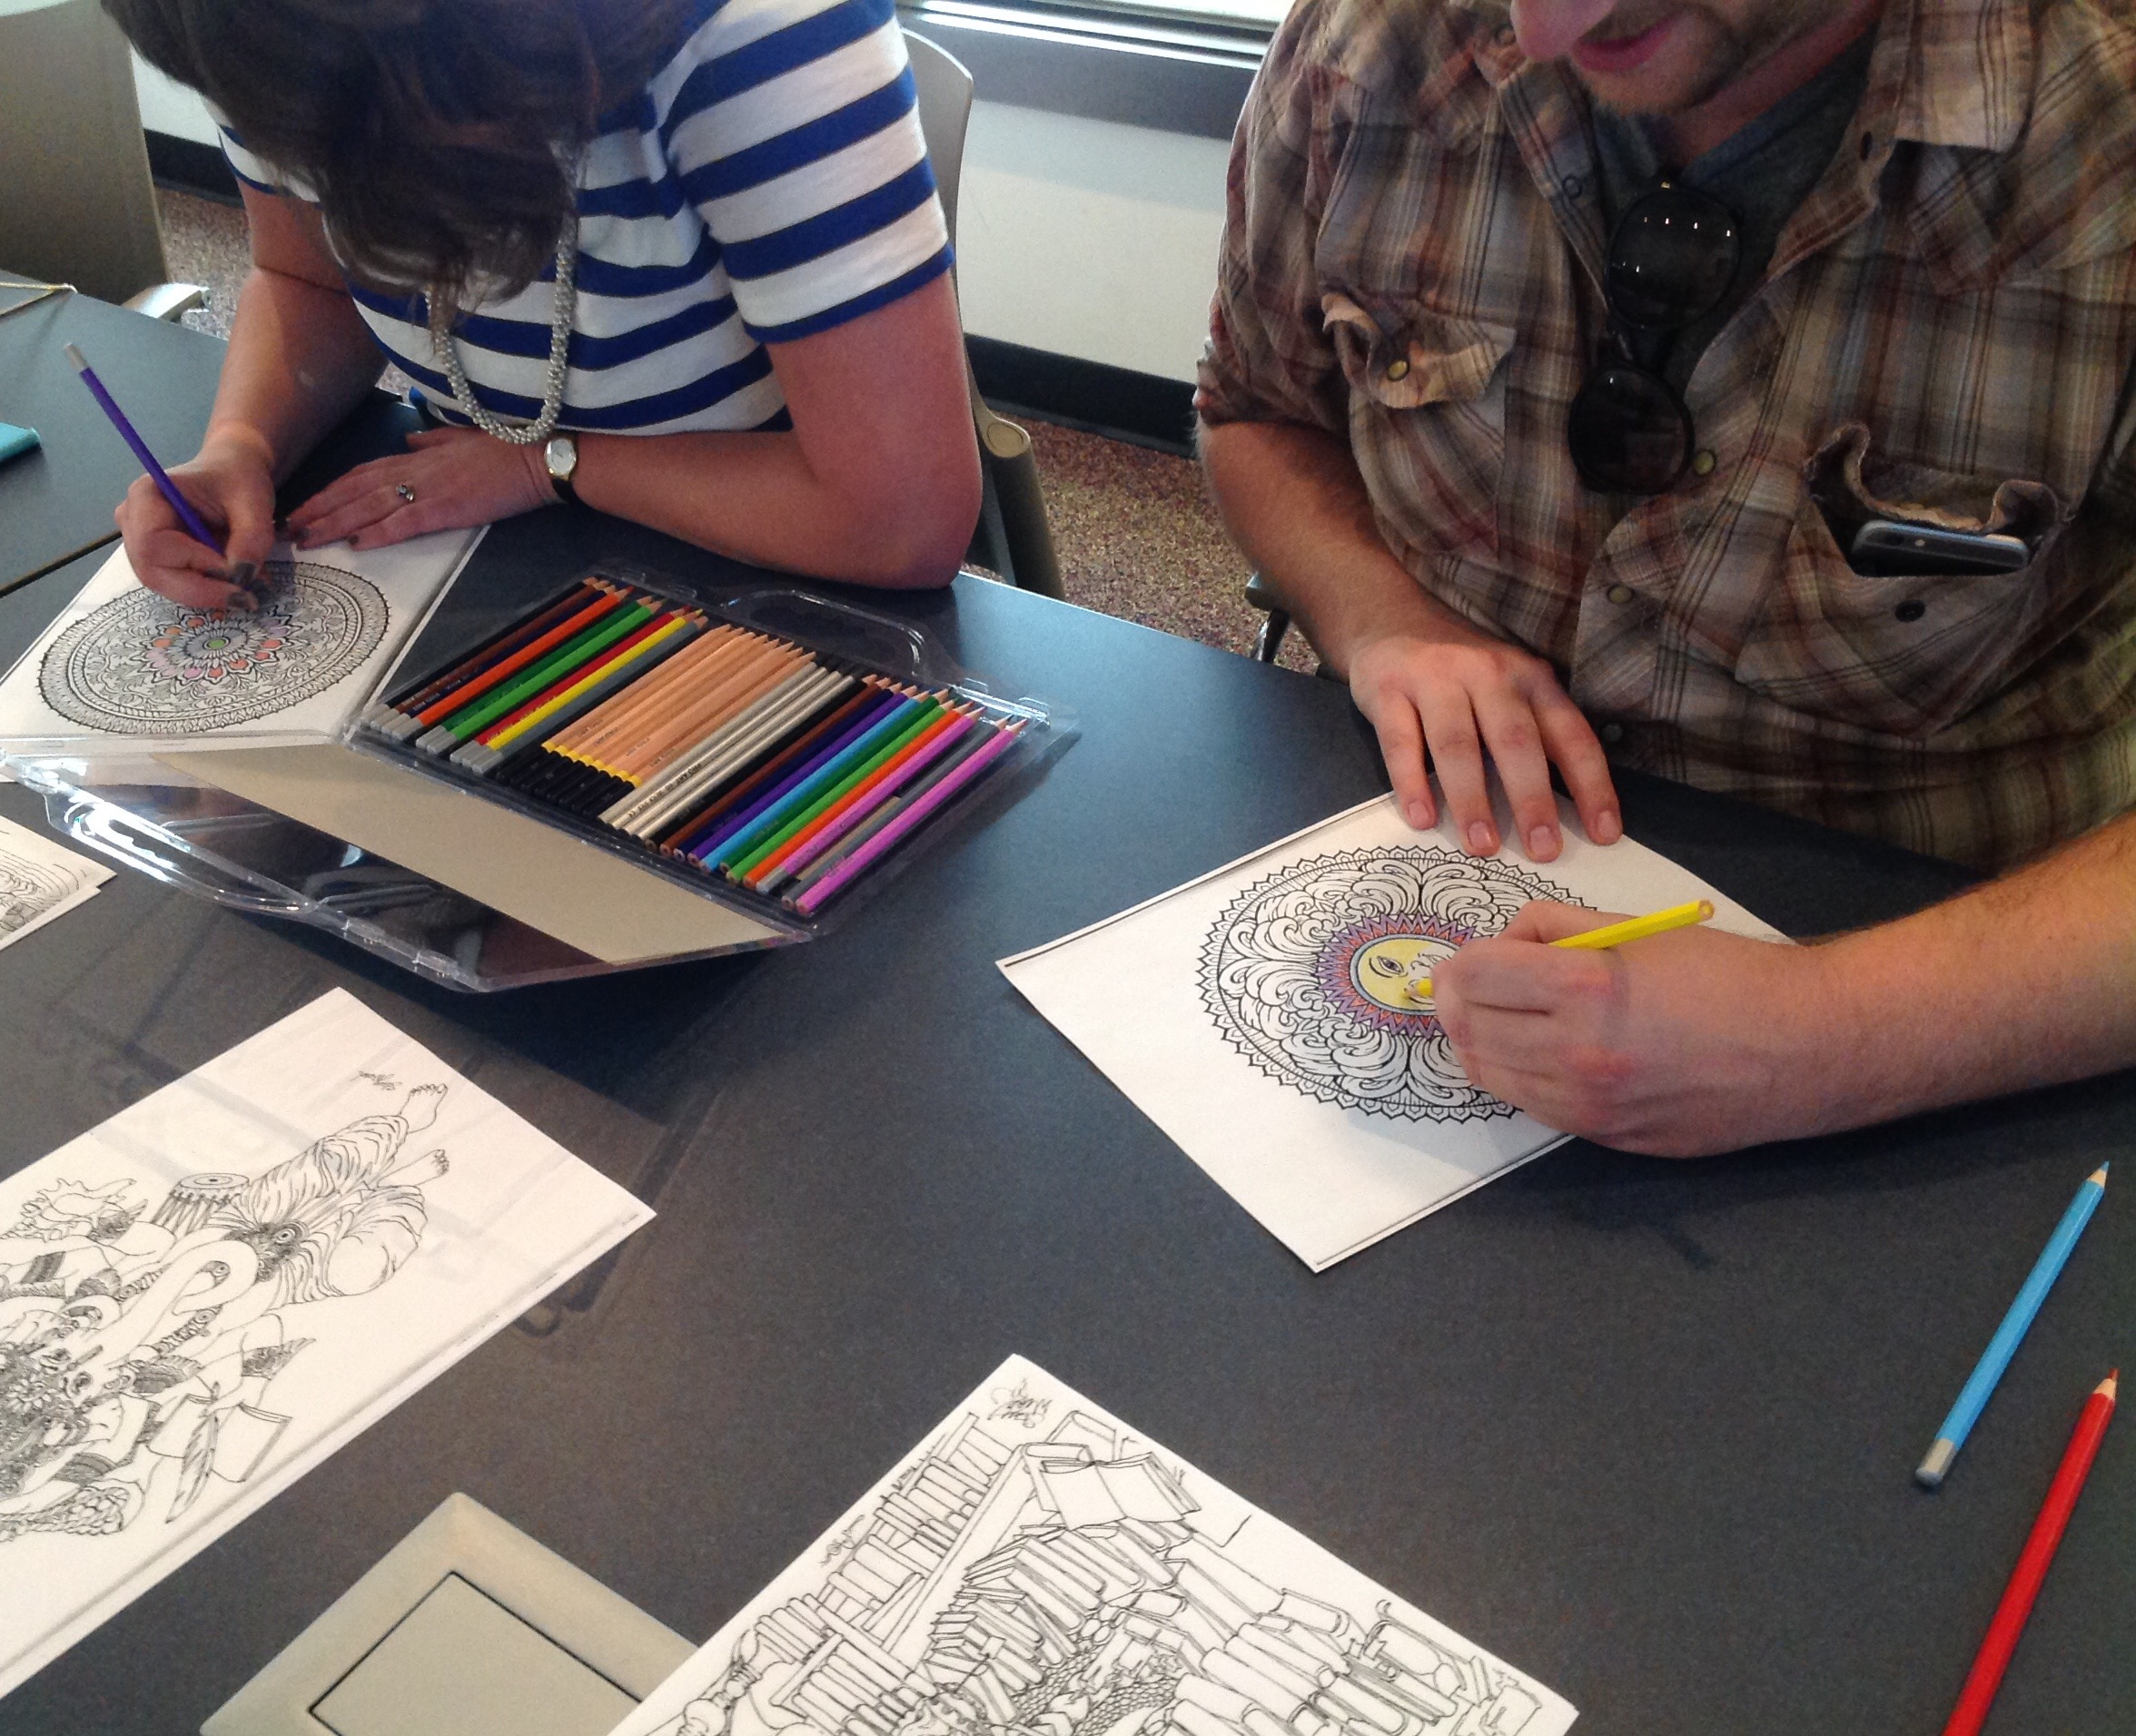 File:Adult Coloring program.jpg - Wikimedia Commons